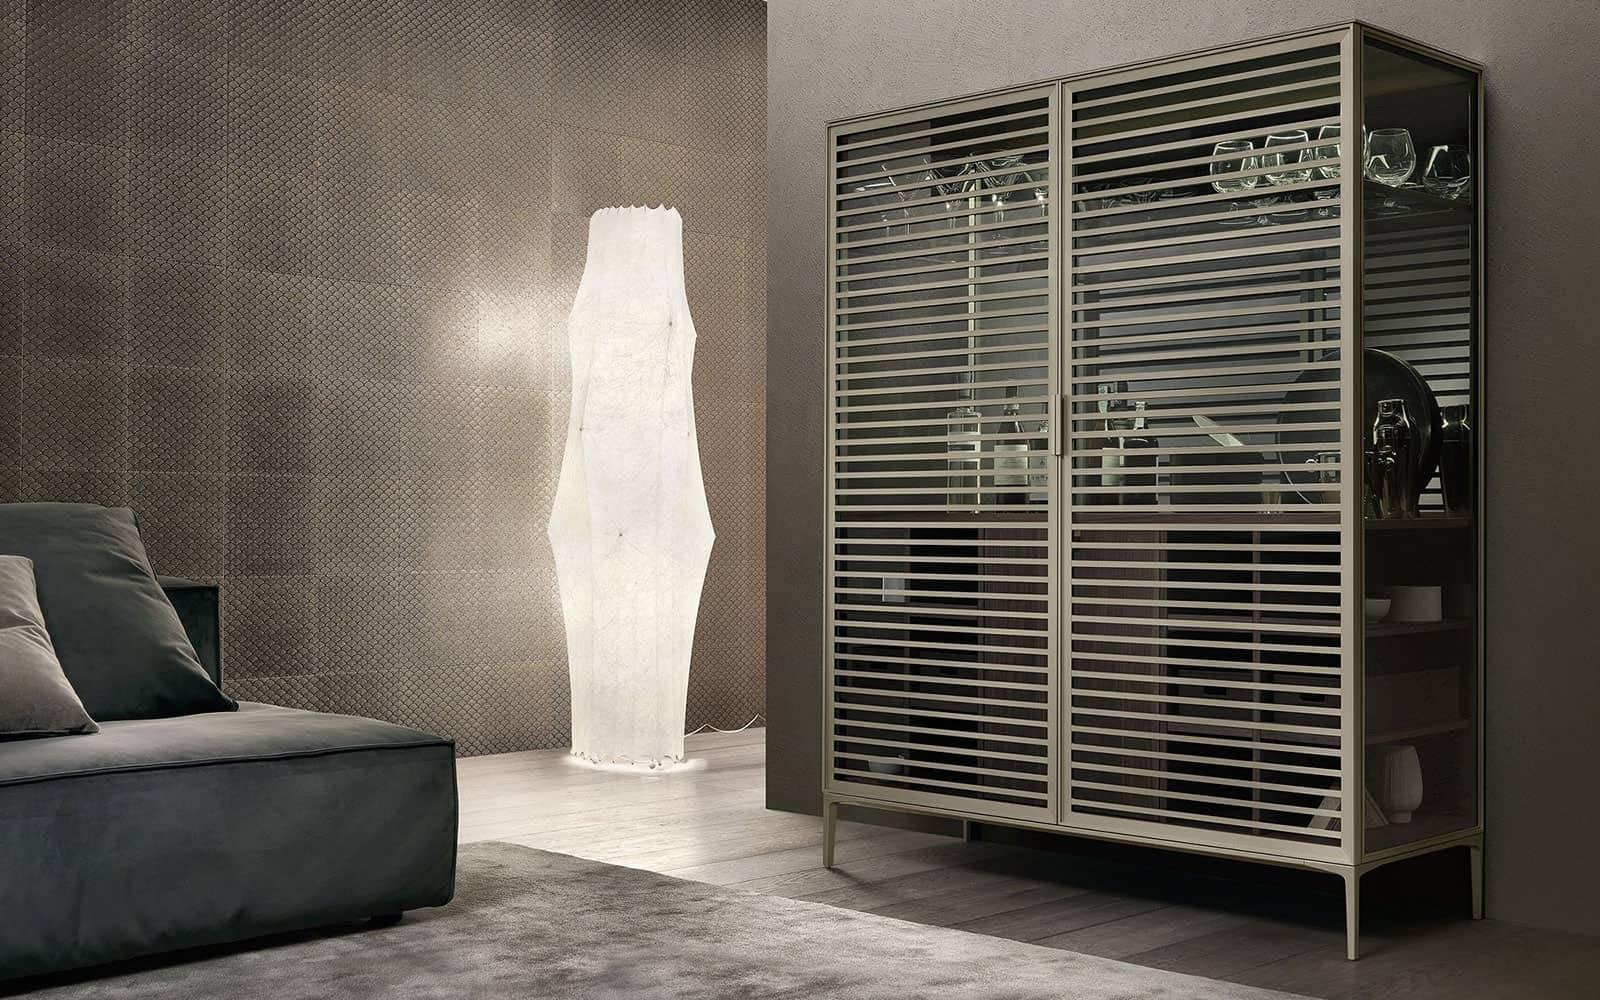 moderne drankmeubel met glazen deuren en houten kastinterieur. Met geïntegreerde koeling en LED-verlichitng. Rimadesio Alambra